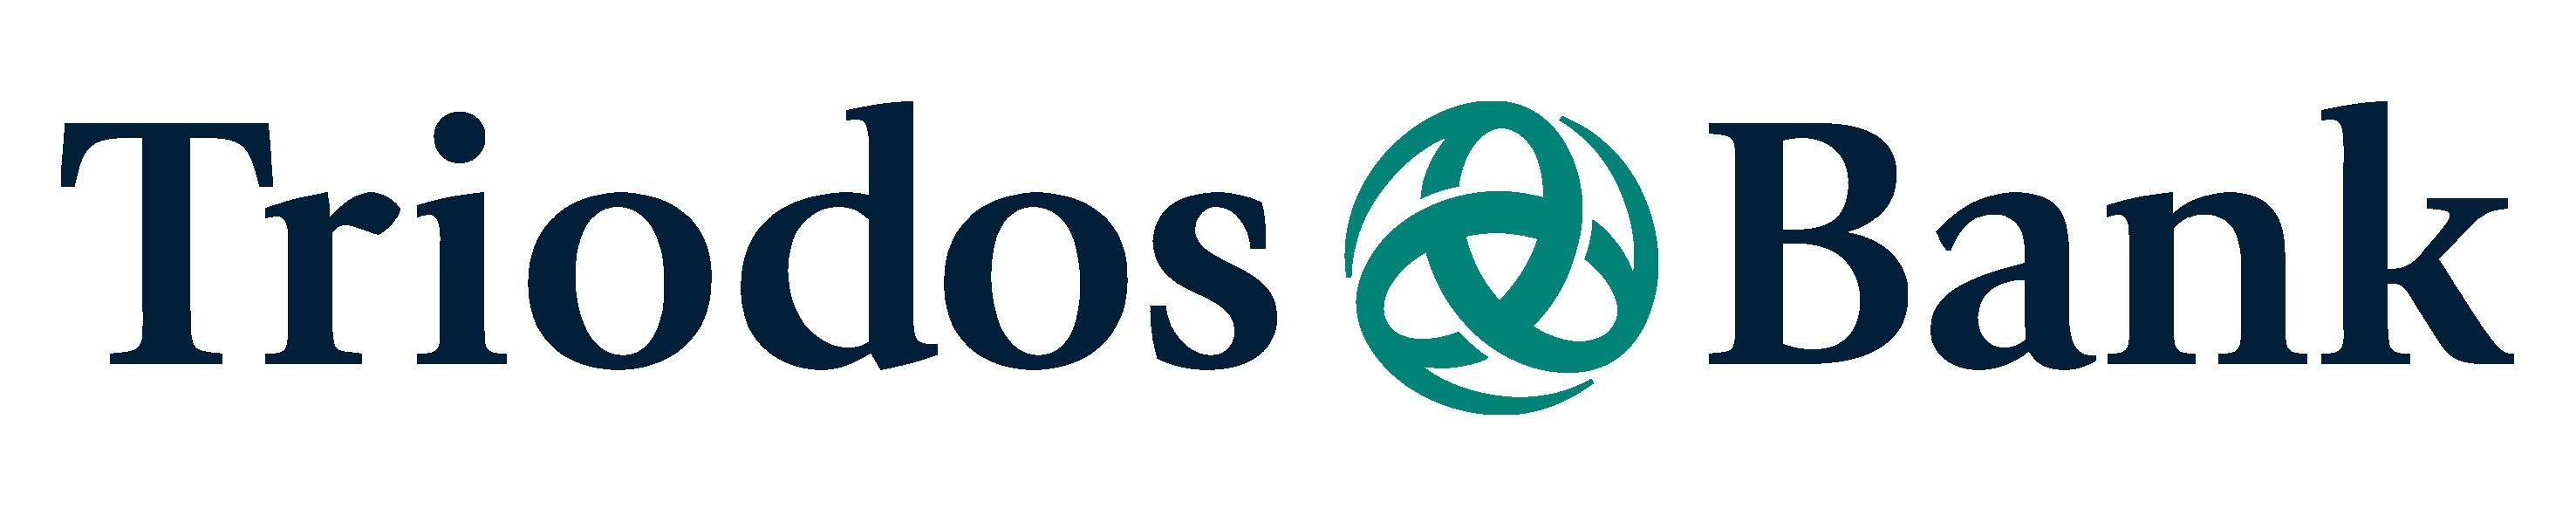 TB_Triodos_Bank_logo